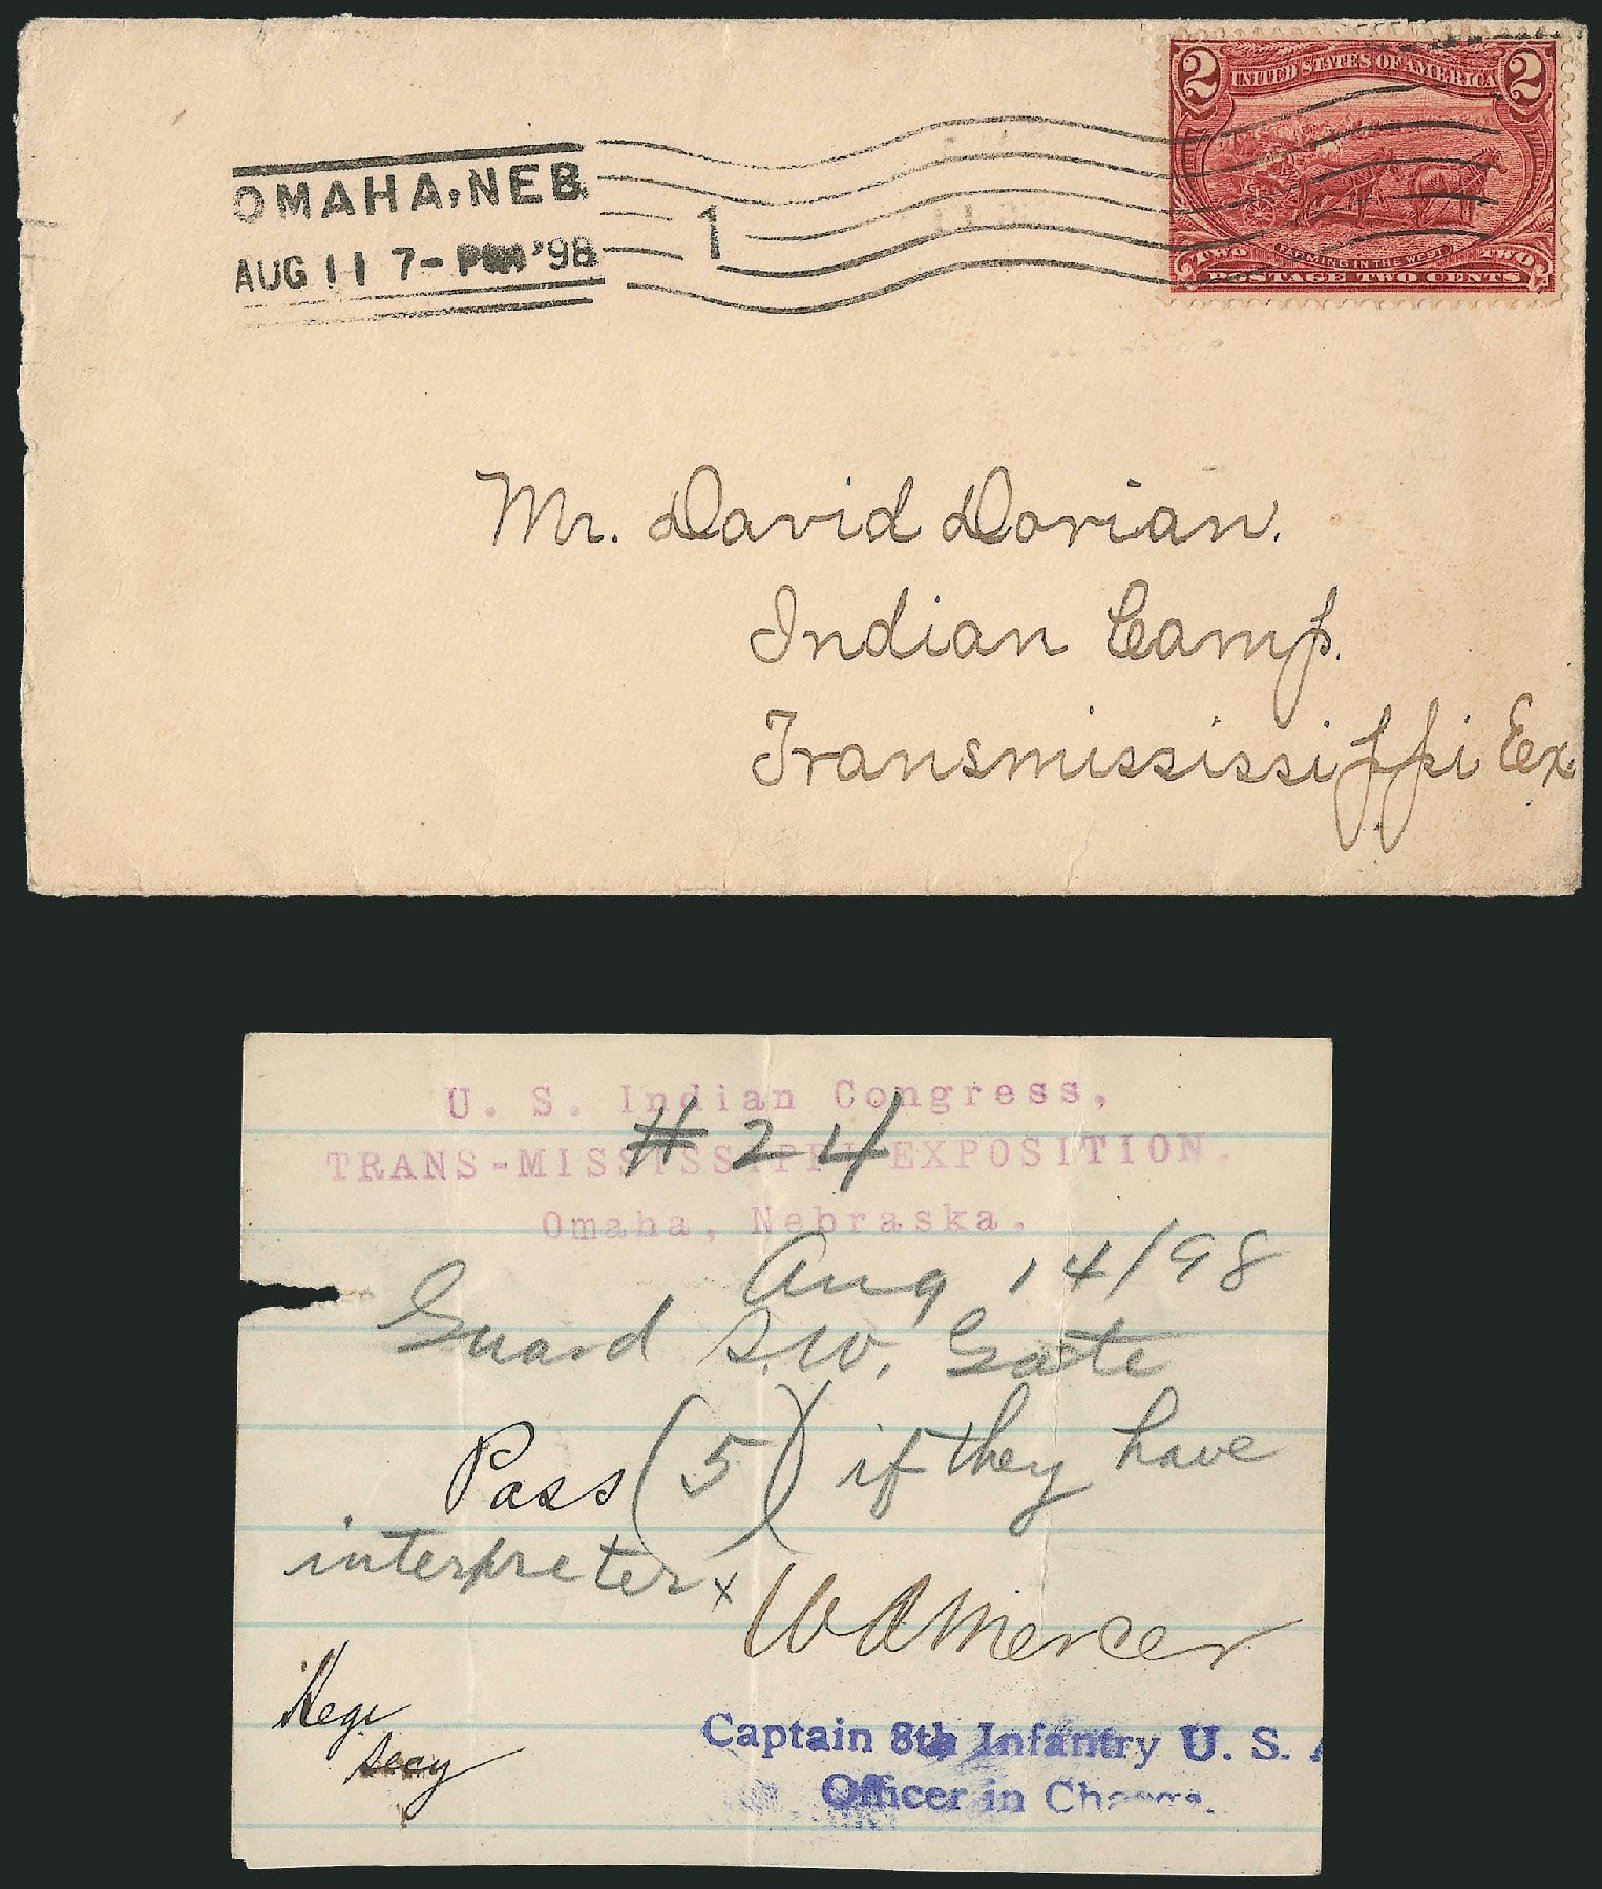 US Stamp Values Scott Catalog 286 - 2c 1898 Trans Mississippi Exposition. Robert Siegel Auction Galleries, Nov 2013, Sale 1056, Lot 373